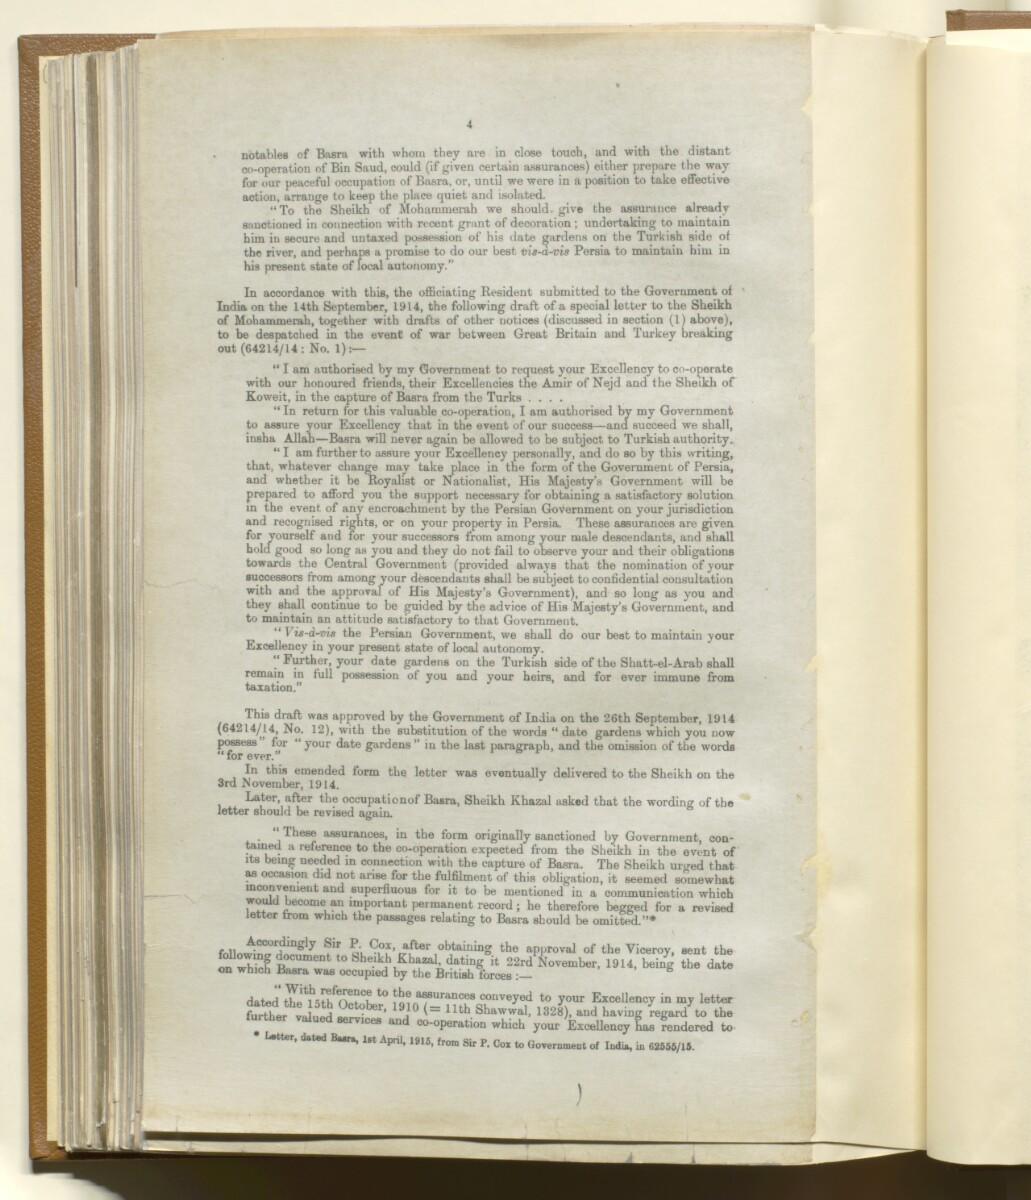 'Memorandum on British Commitments (during the War) to the Gulf Chiefs' [144v] (4/14)